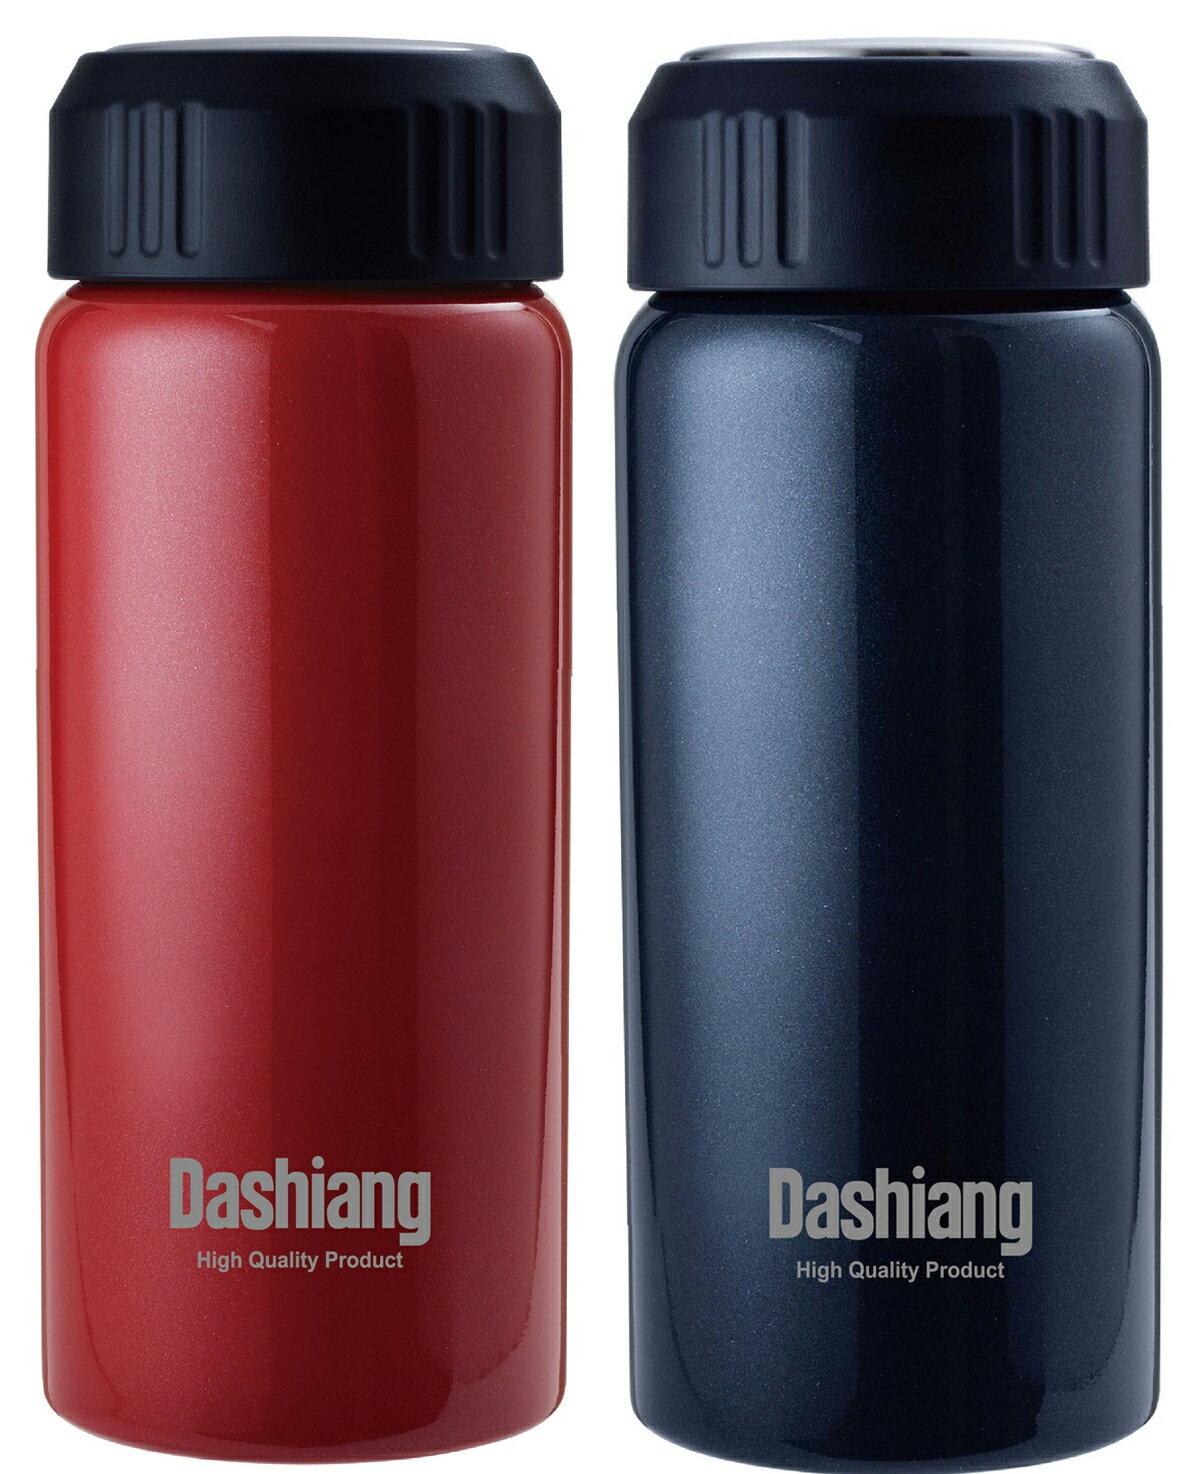 【RV運動家族】Dashiang 520ML真水濾網保溫瓶(黑、紅兩色)